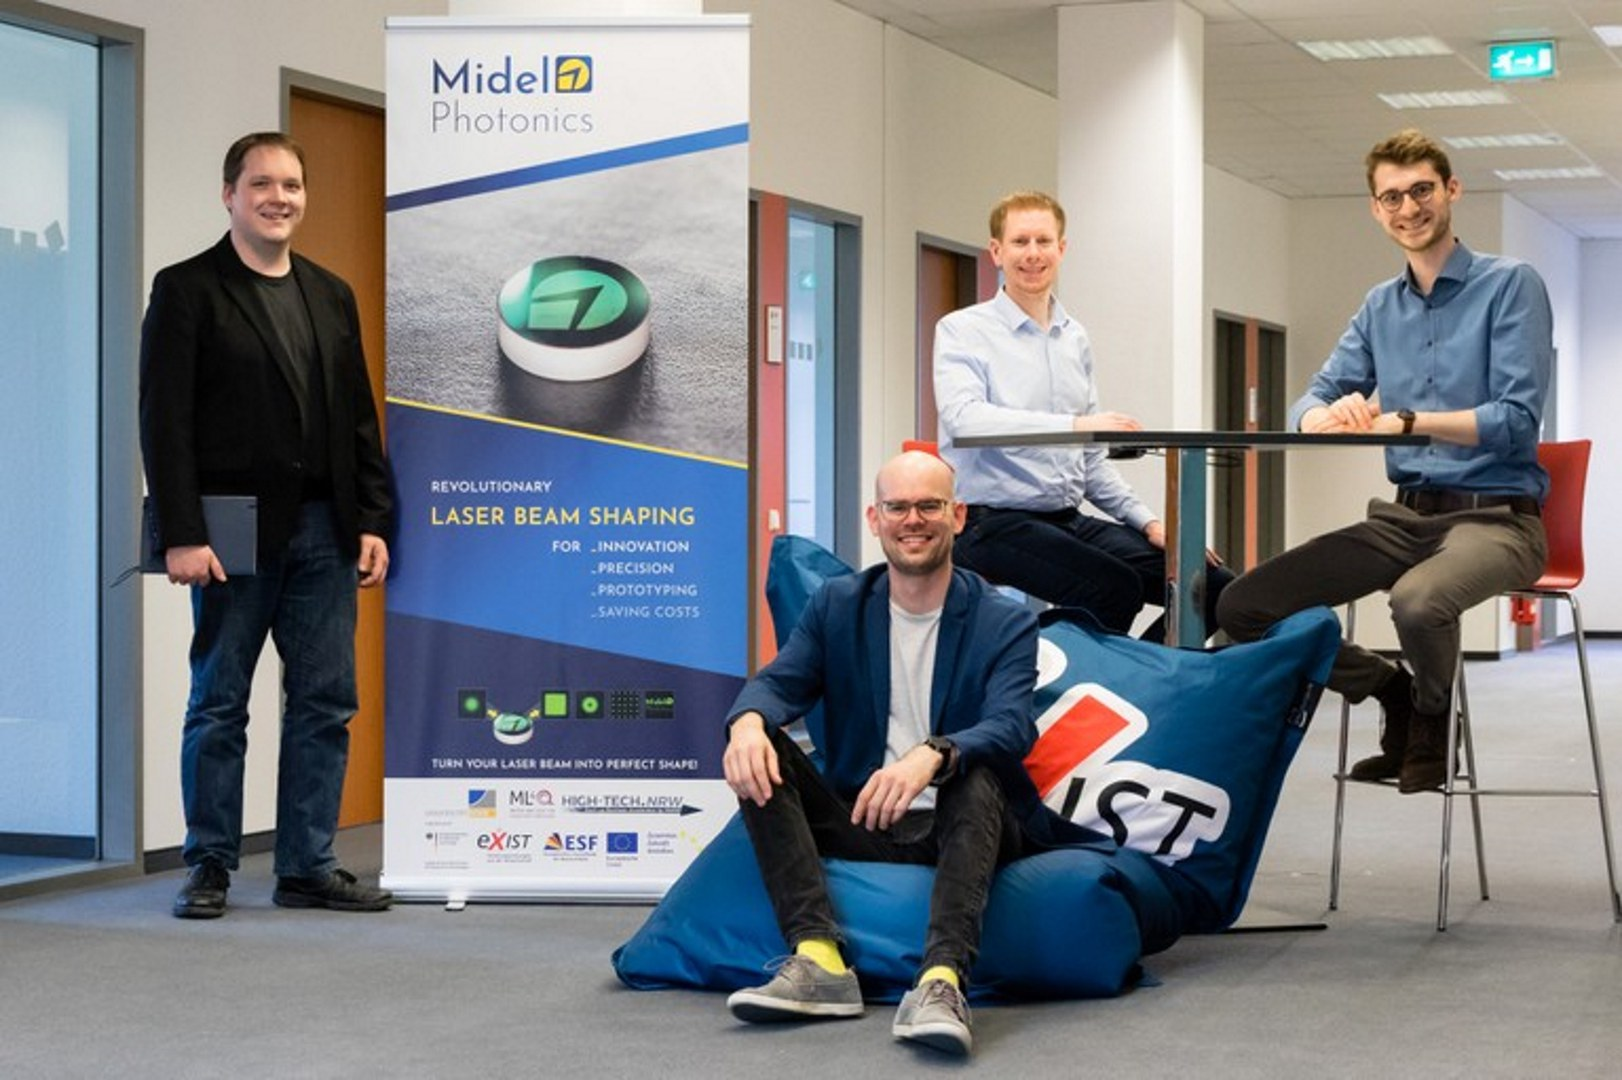 Founders of Midel Photonics